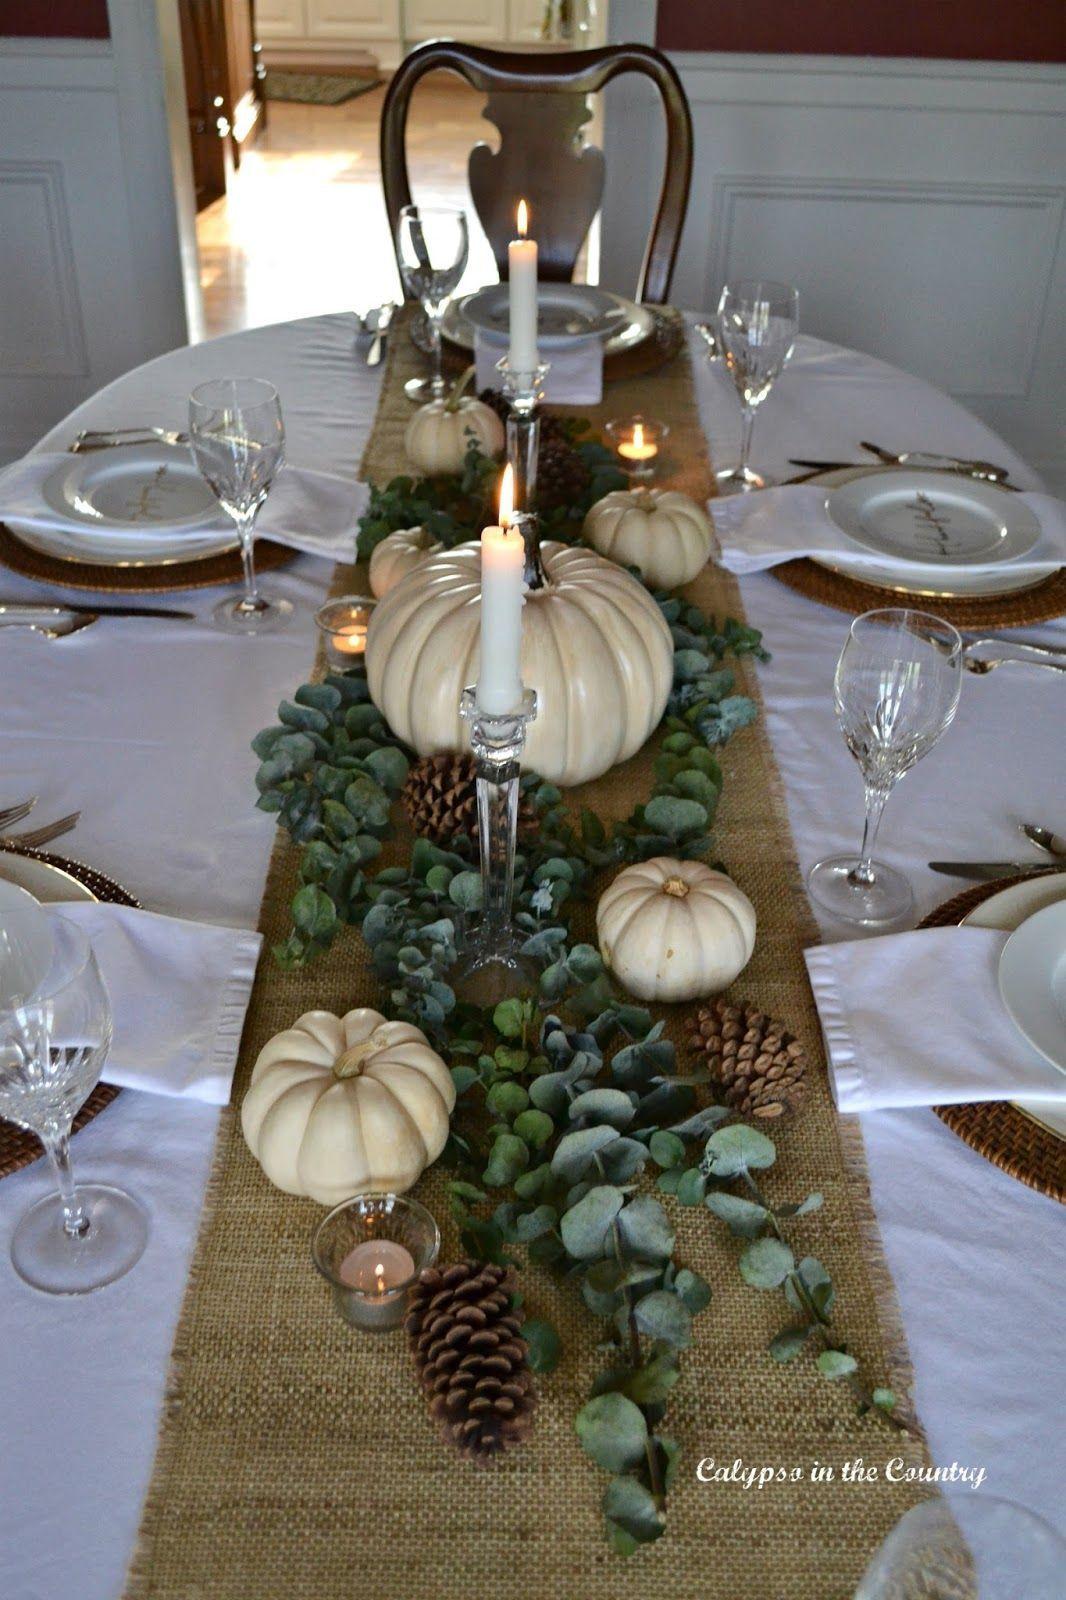 #Eucalyptus #Pumpkins #Setting #Table #textures #thanksgiving #White Thanksgiving Table Setting with White Pumpkins, textures and eucalyptus.  #thanksgivingtable #thanksgivingdecorations #whitepumpkins #tablesettings #thanksgivingtablesettings